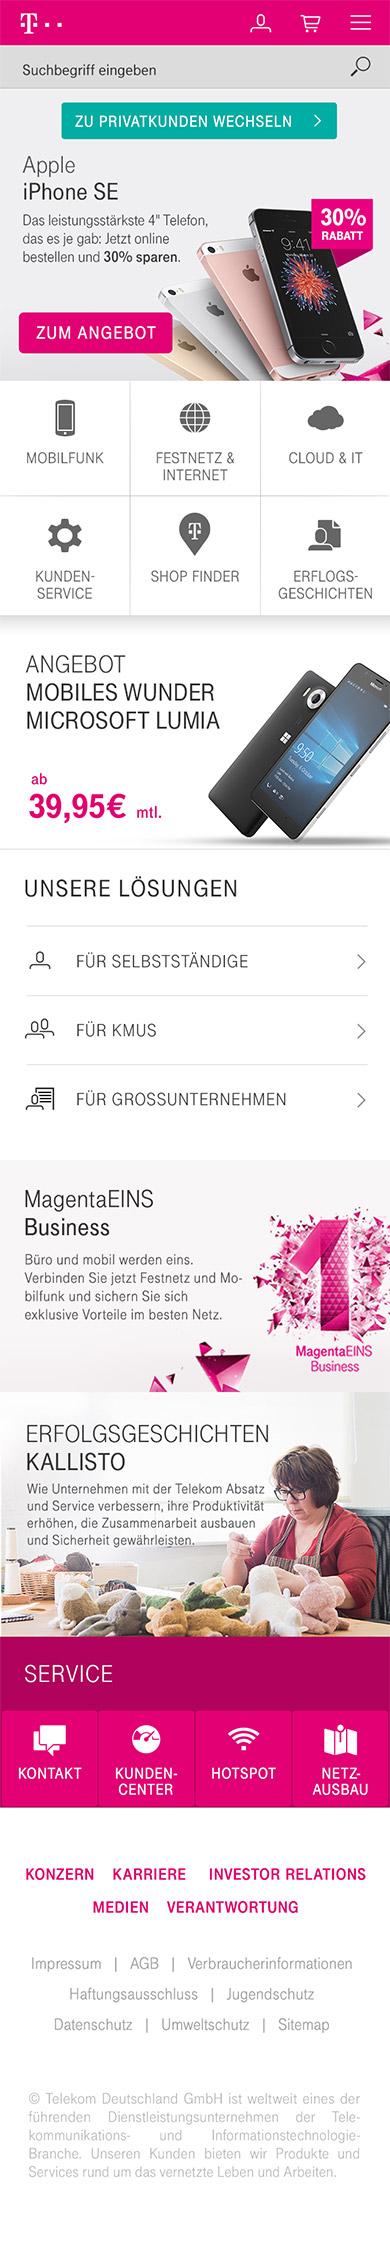 bartek-elsner_Telekom-b2b-Home-phone